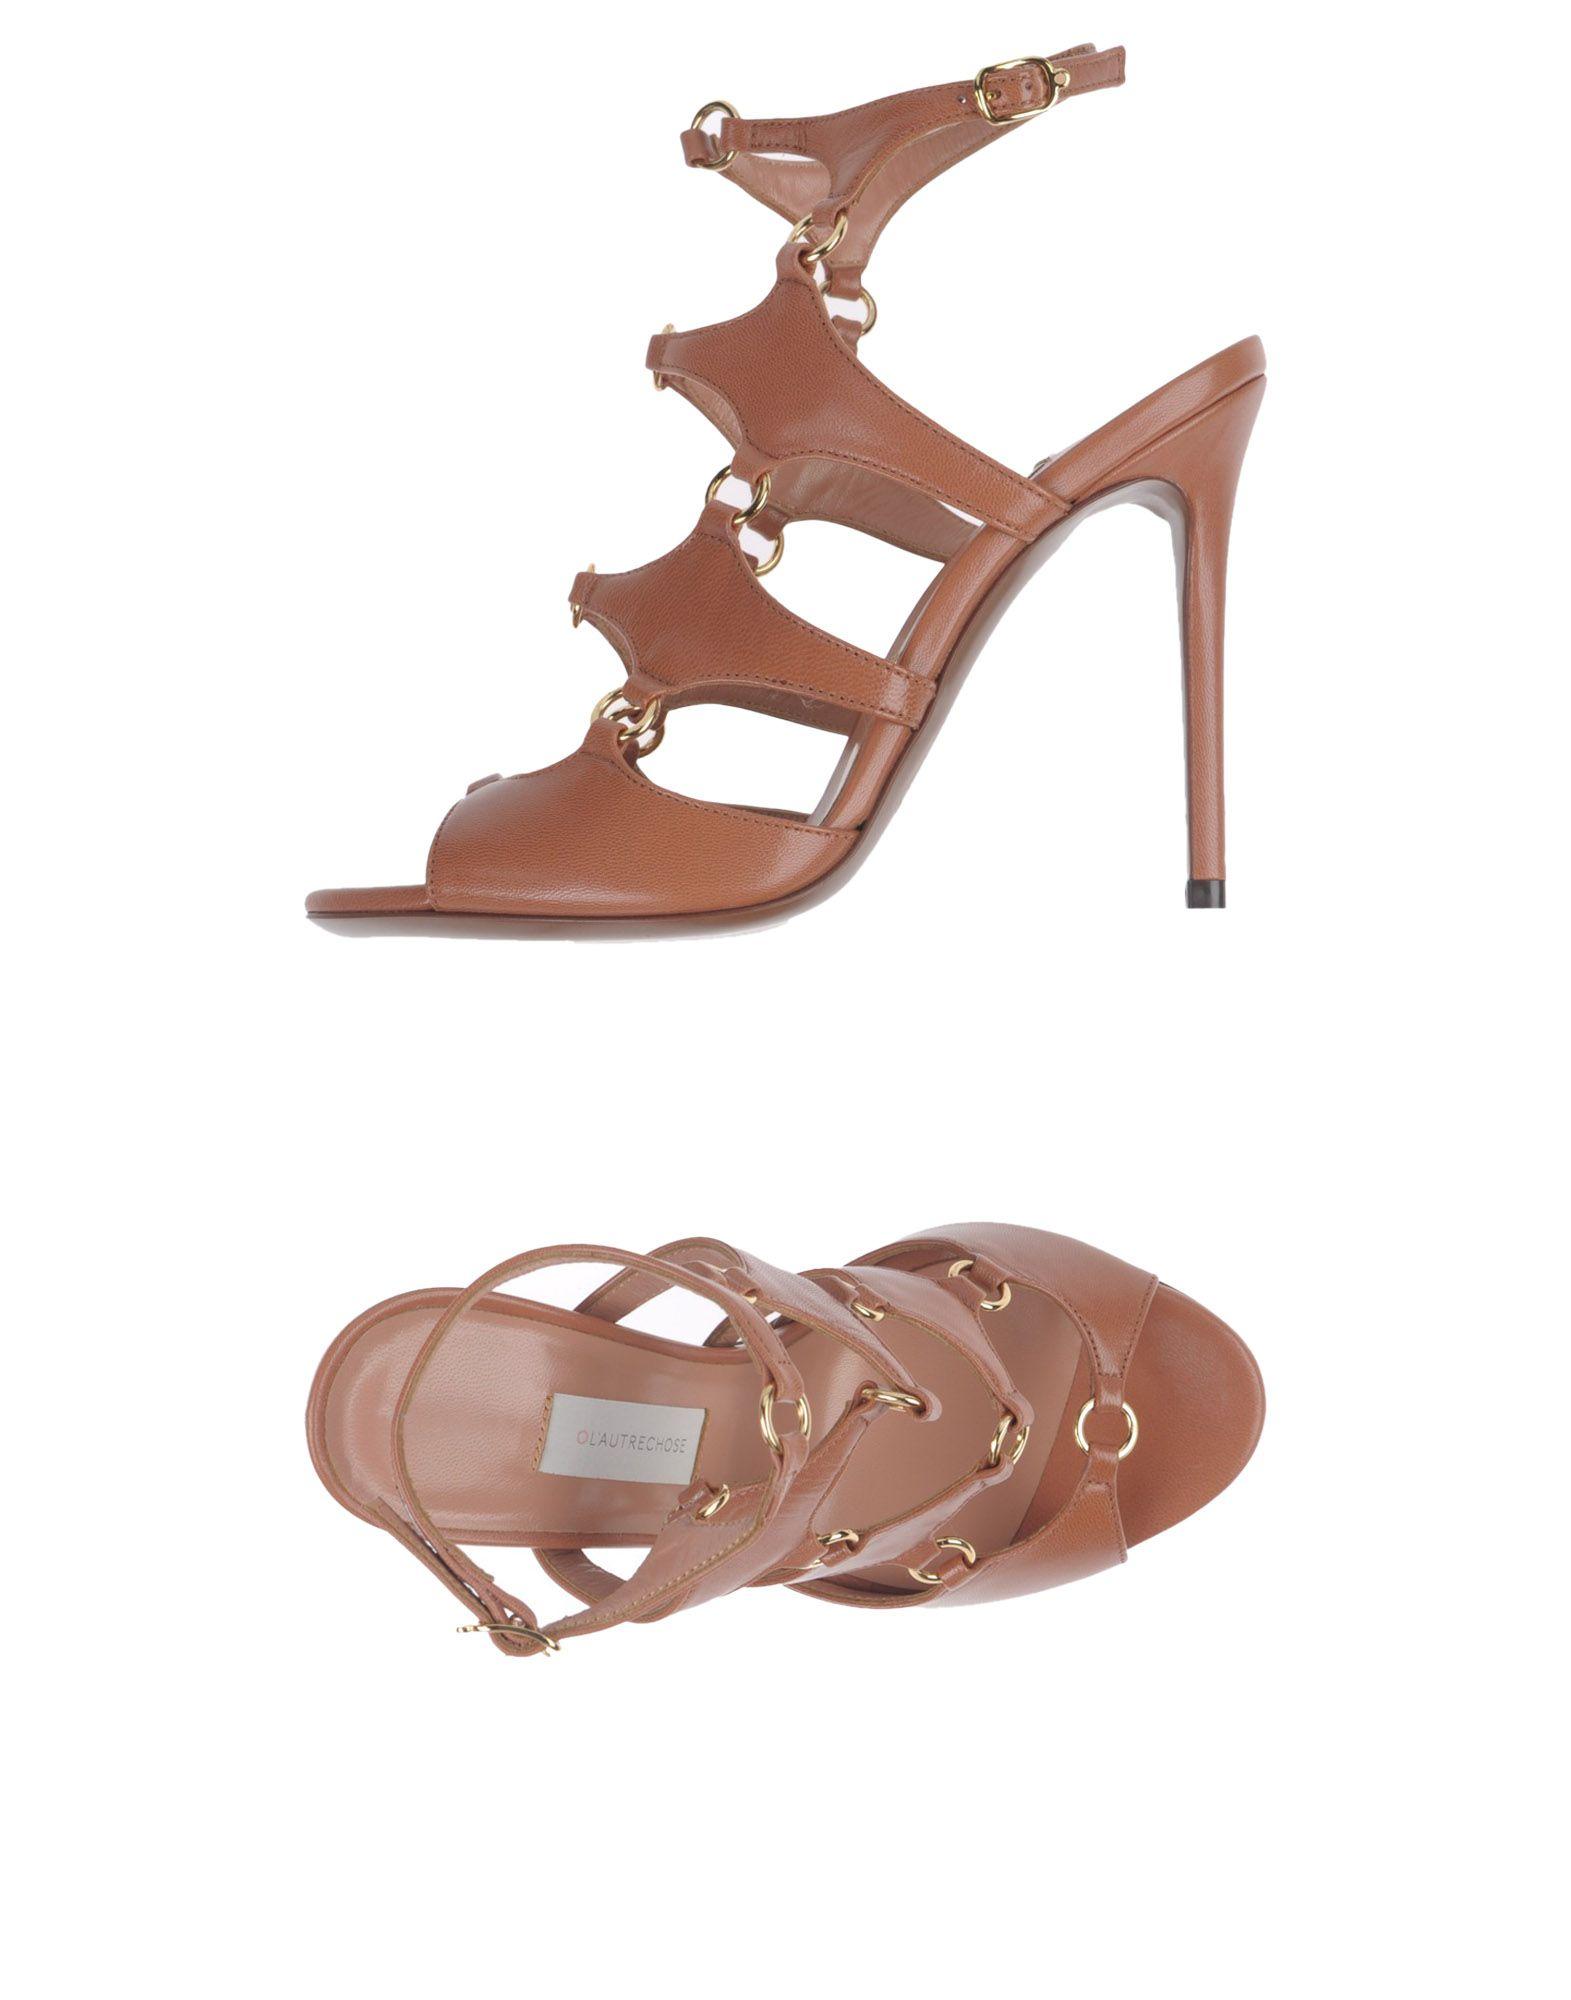 Gut Autre um billige Schuhe zu tragenL' Autre Gut Chose Sandalen Damen  11381533NI 797b77